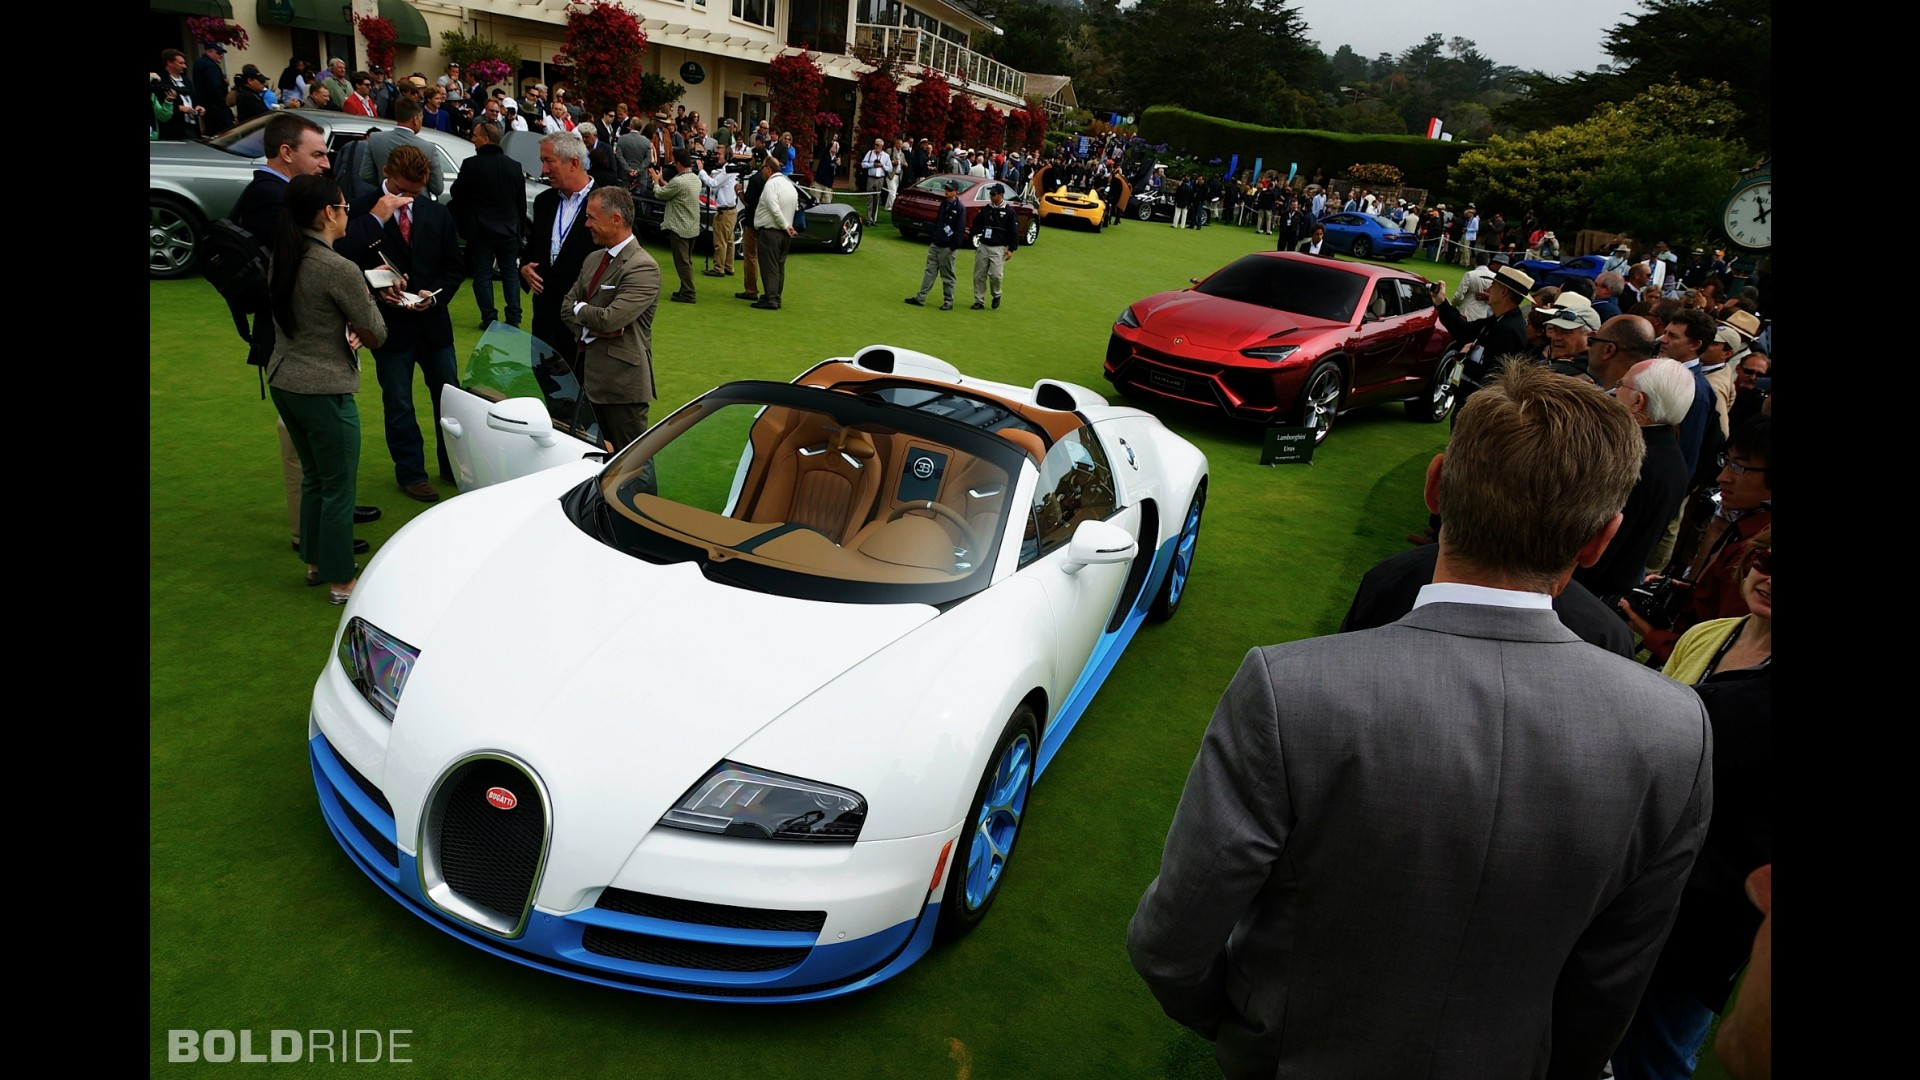 bugatti-veyron-16-4-grand-sport-vitesse-special-edition Terrific Bugatti Veyron 16.4 Grand Sport Vitesse Prix Cars Trend